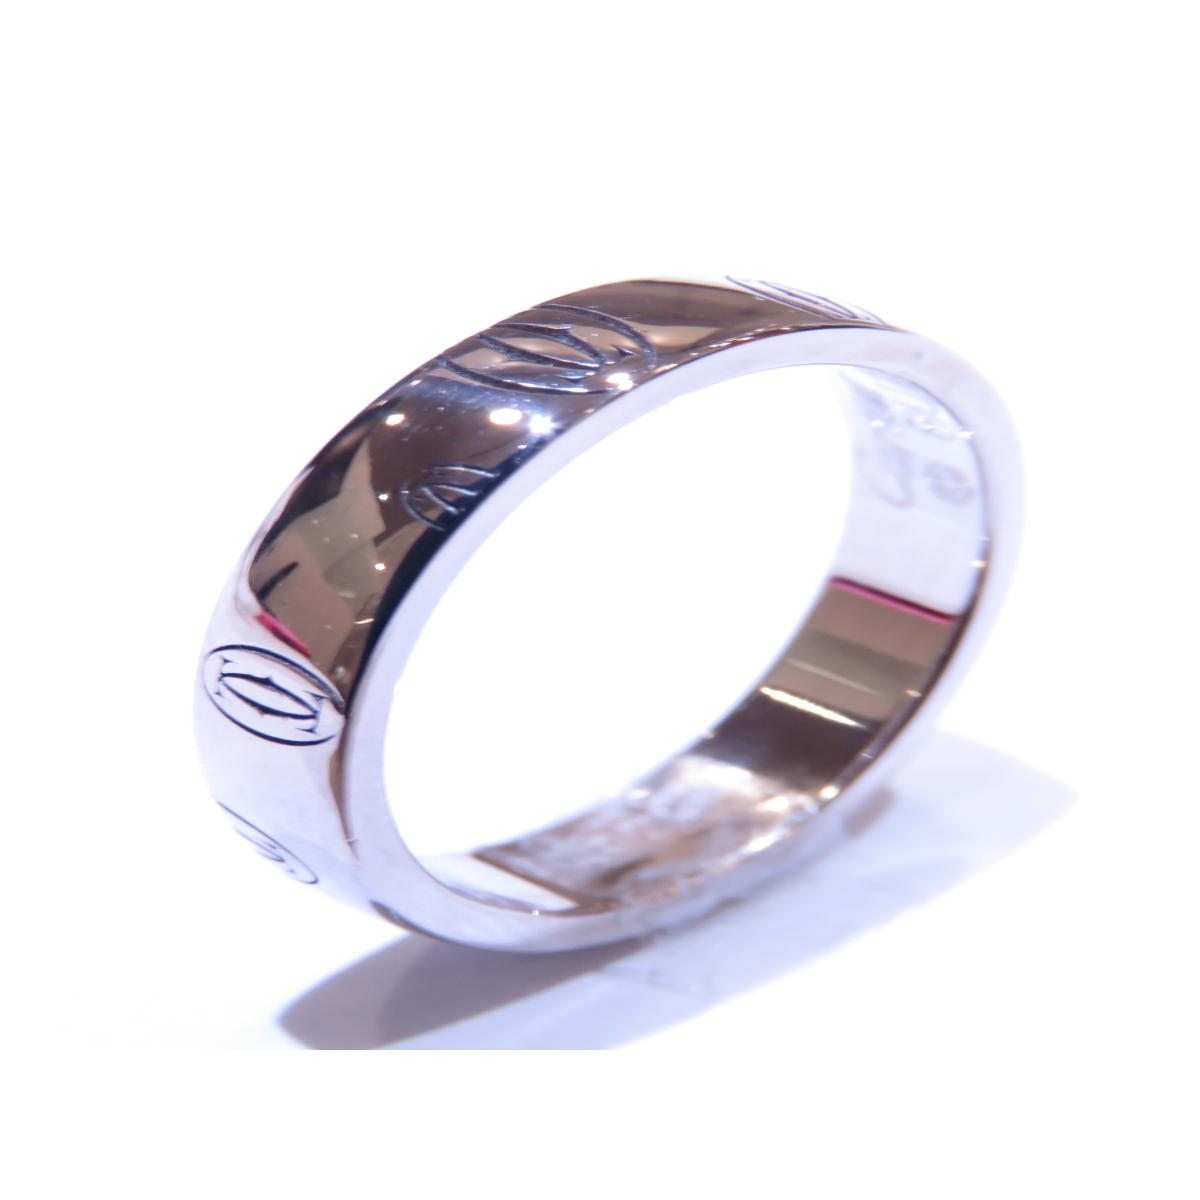 Cartier(カルティエ)/ハッピーバースデー リング 指輪/リング//K18WG(750)ホワイトゴールド/【ランクA】/#49/9号【中古】